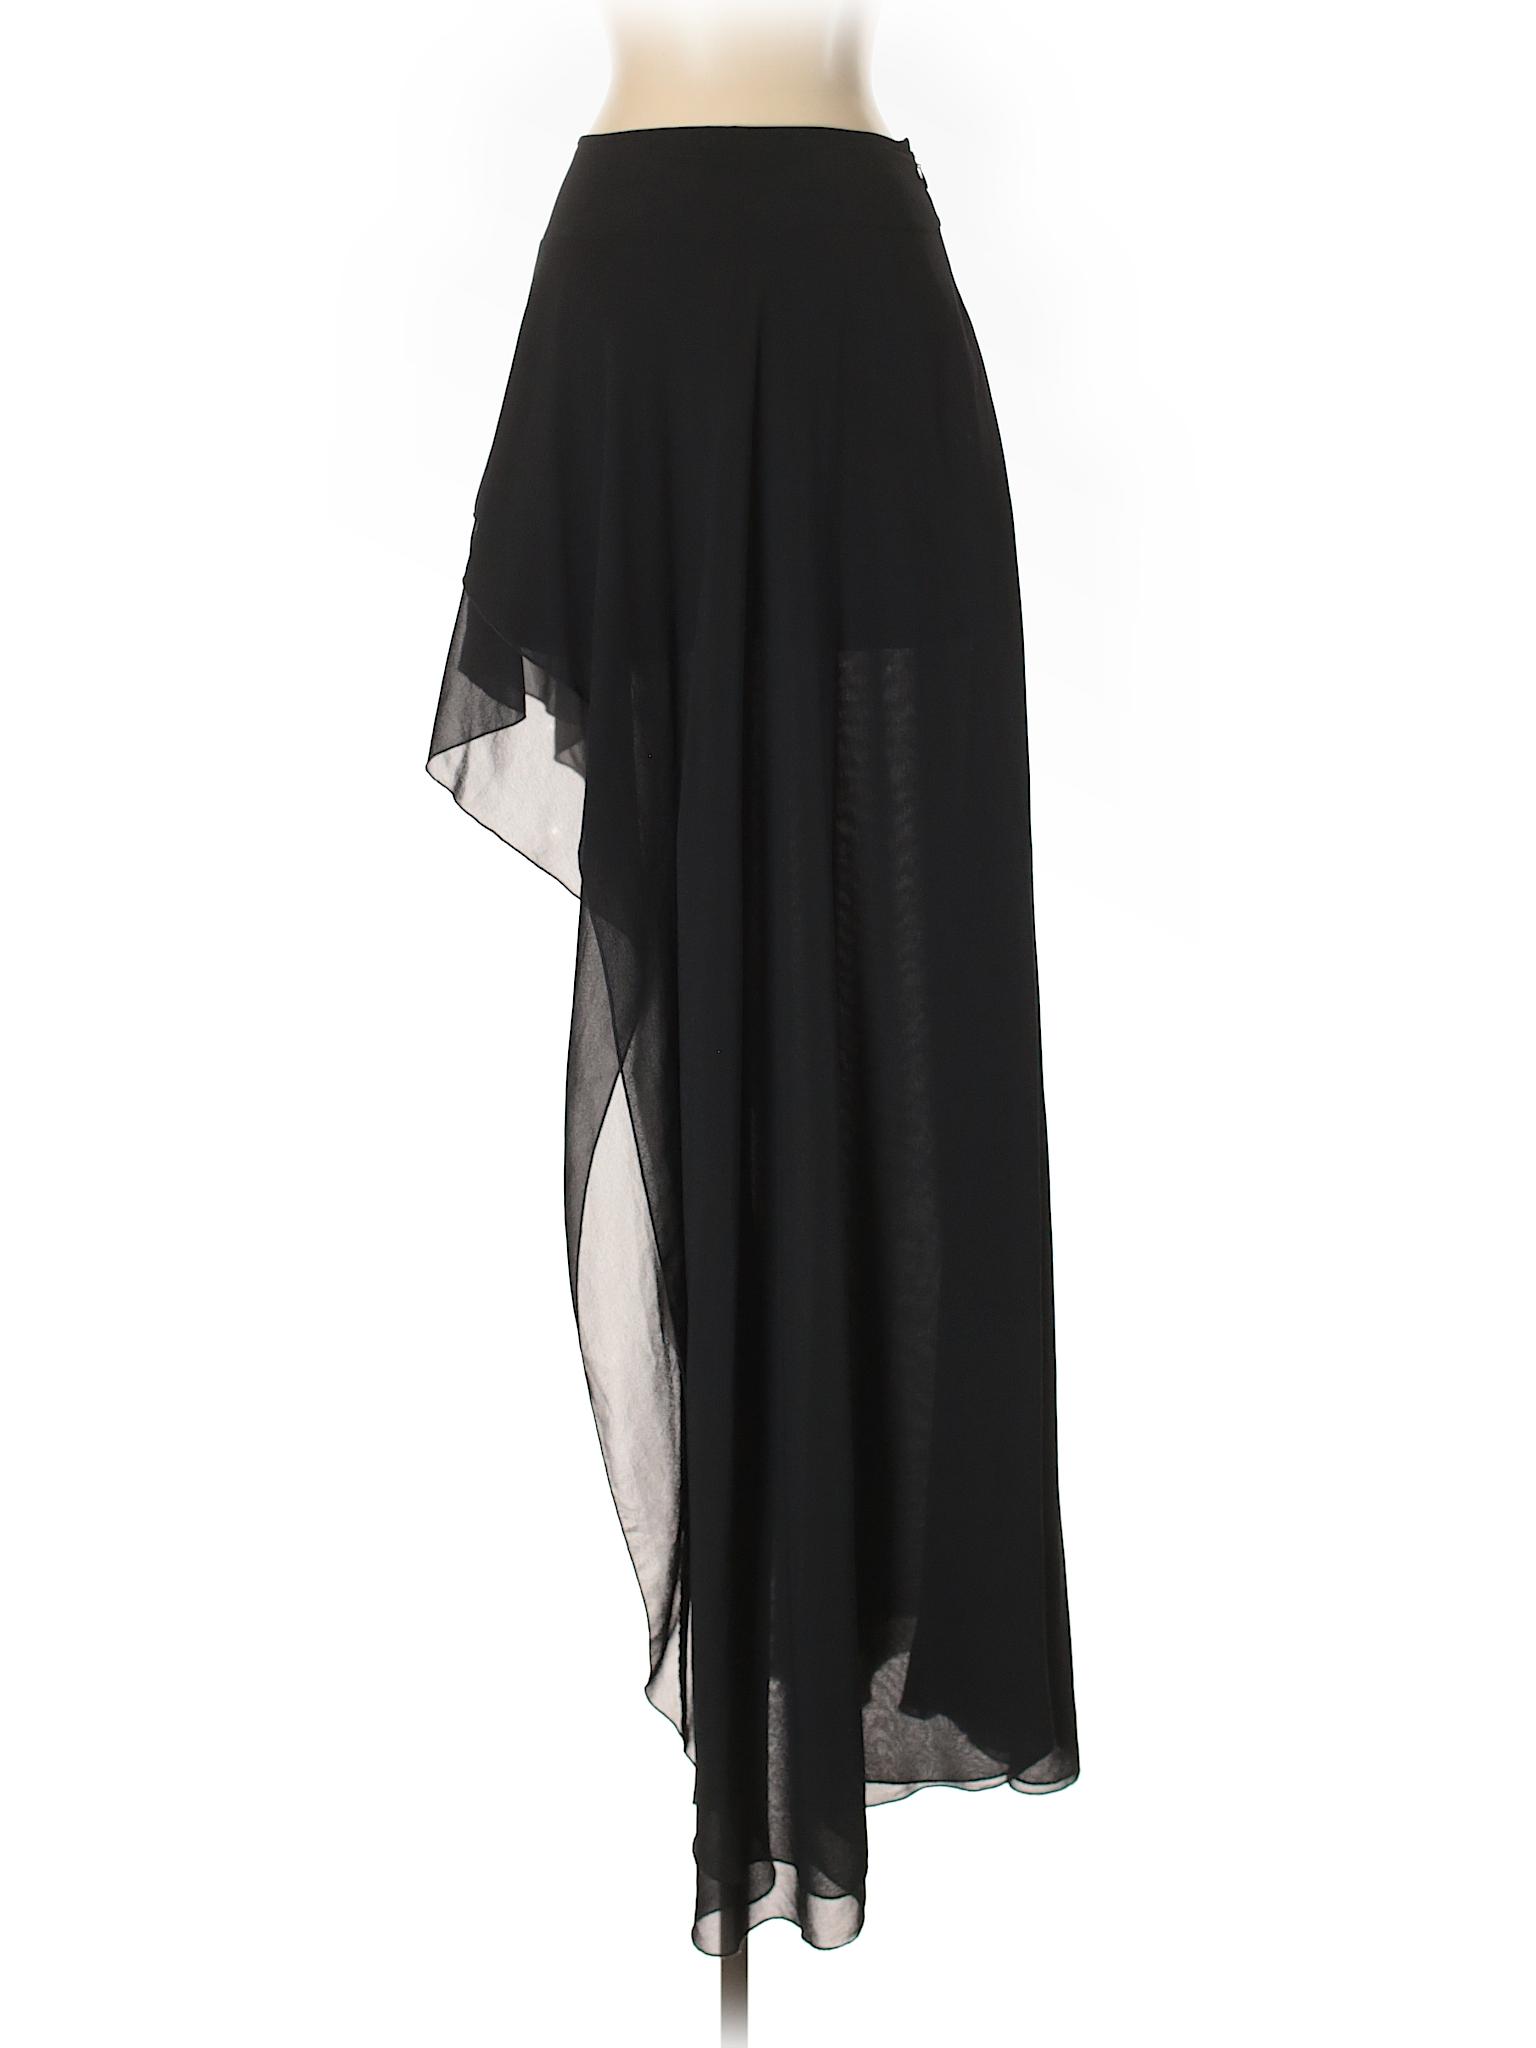 Jessica Casual Mcclintock Boutique Skirt Leisure Xwnx5qzT